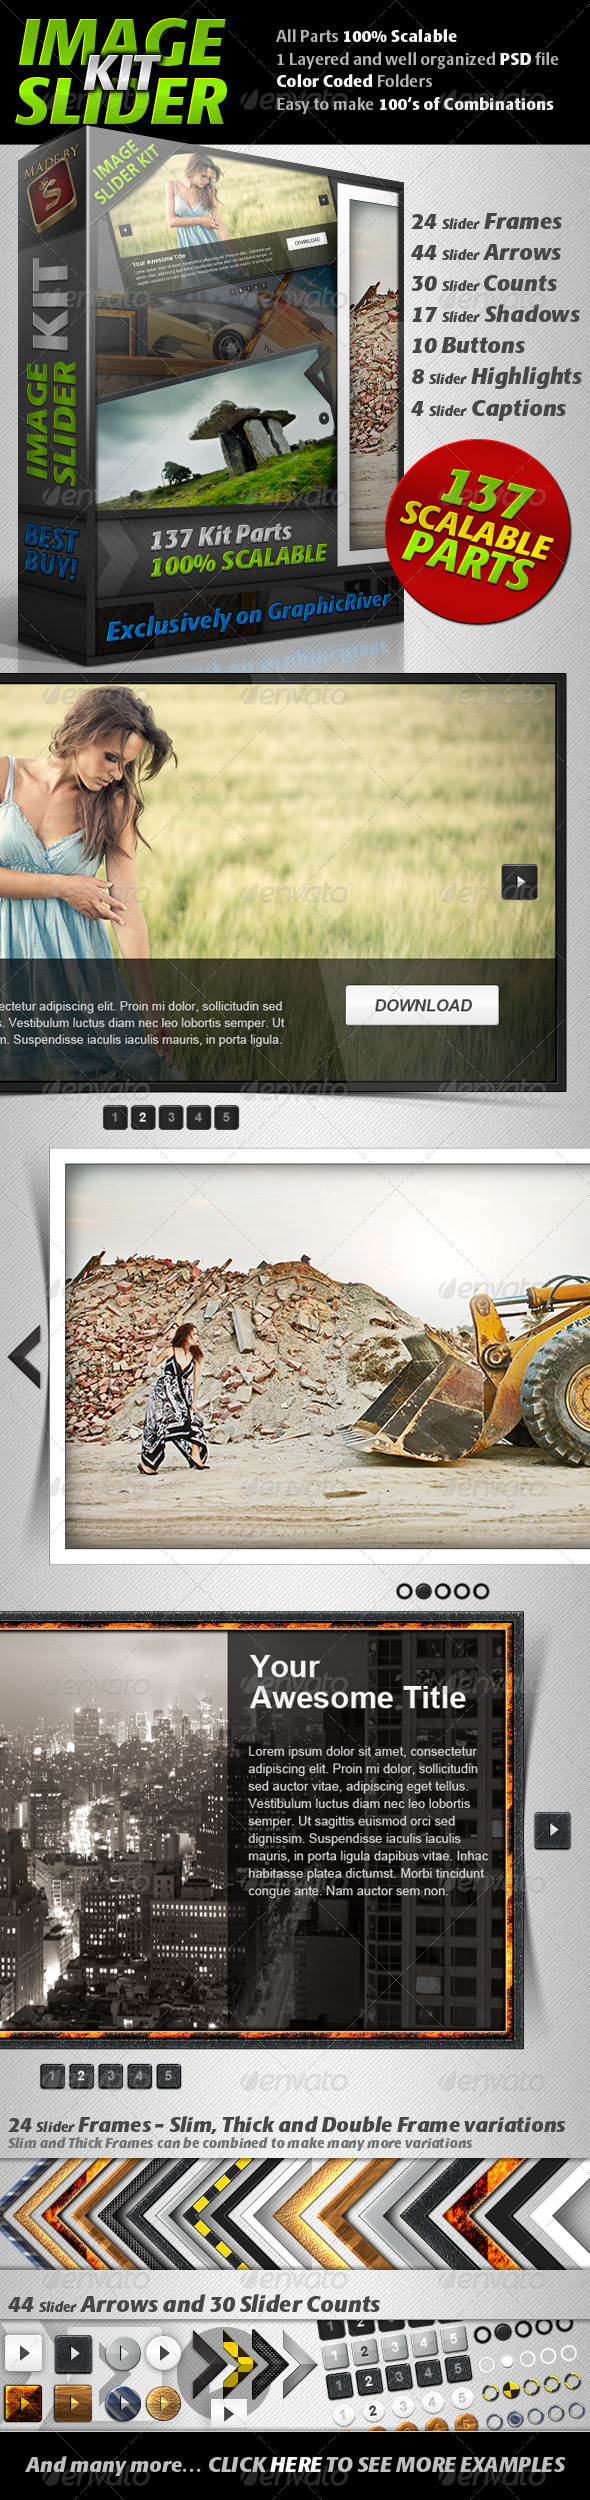 GraphicRiver Image Slider Kit 407080